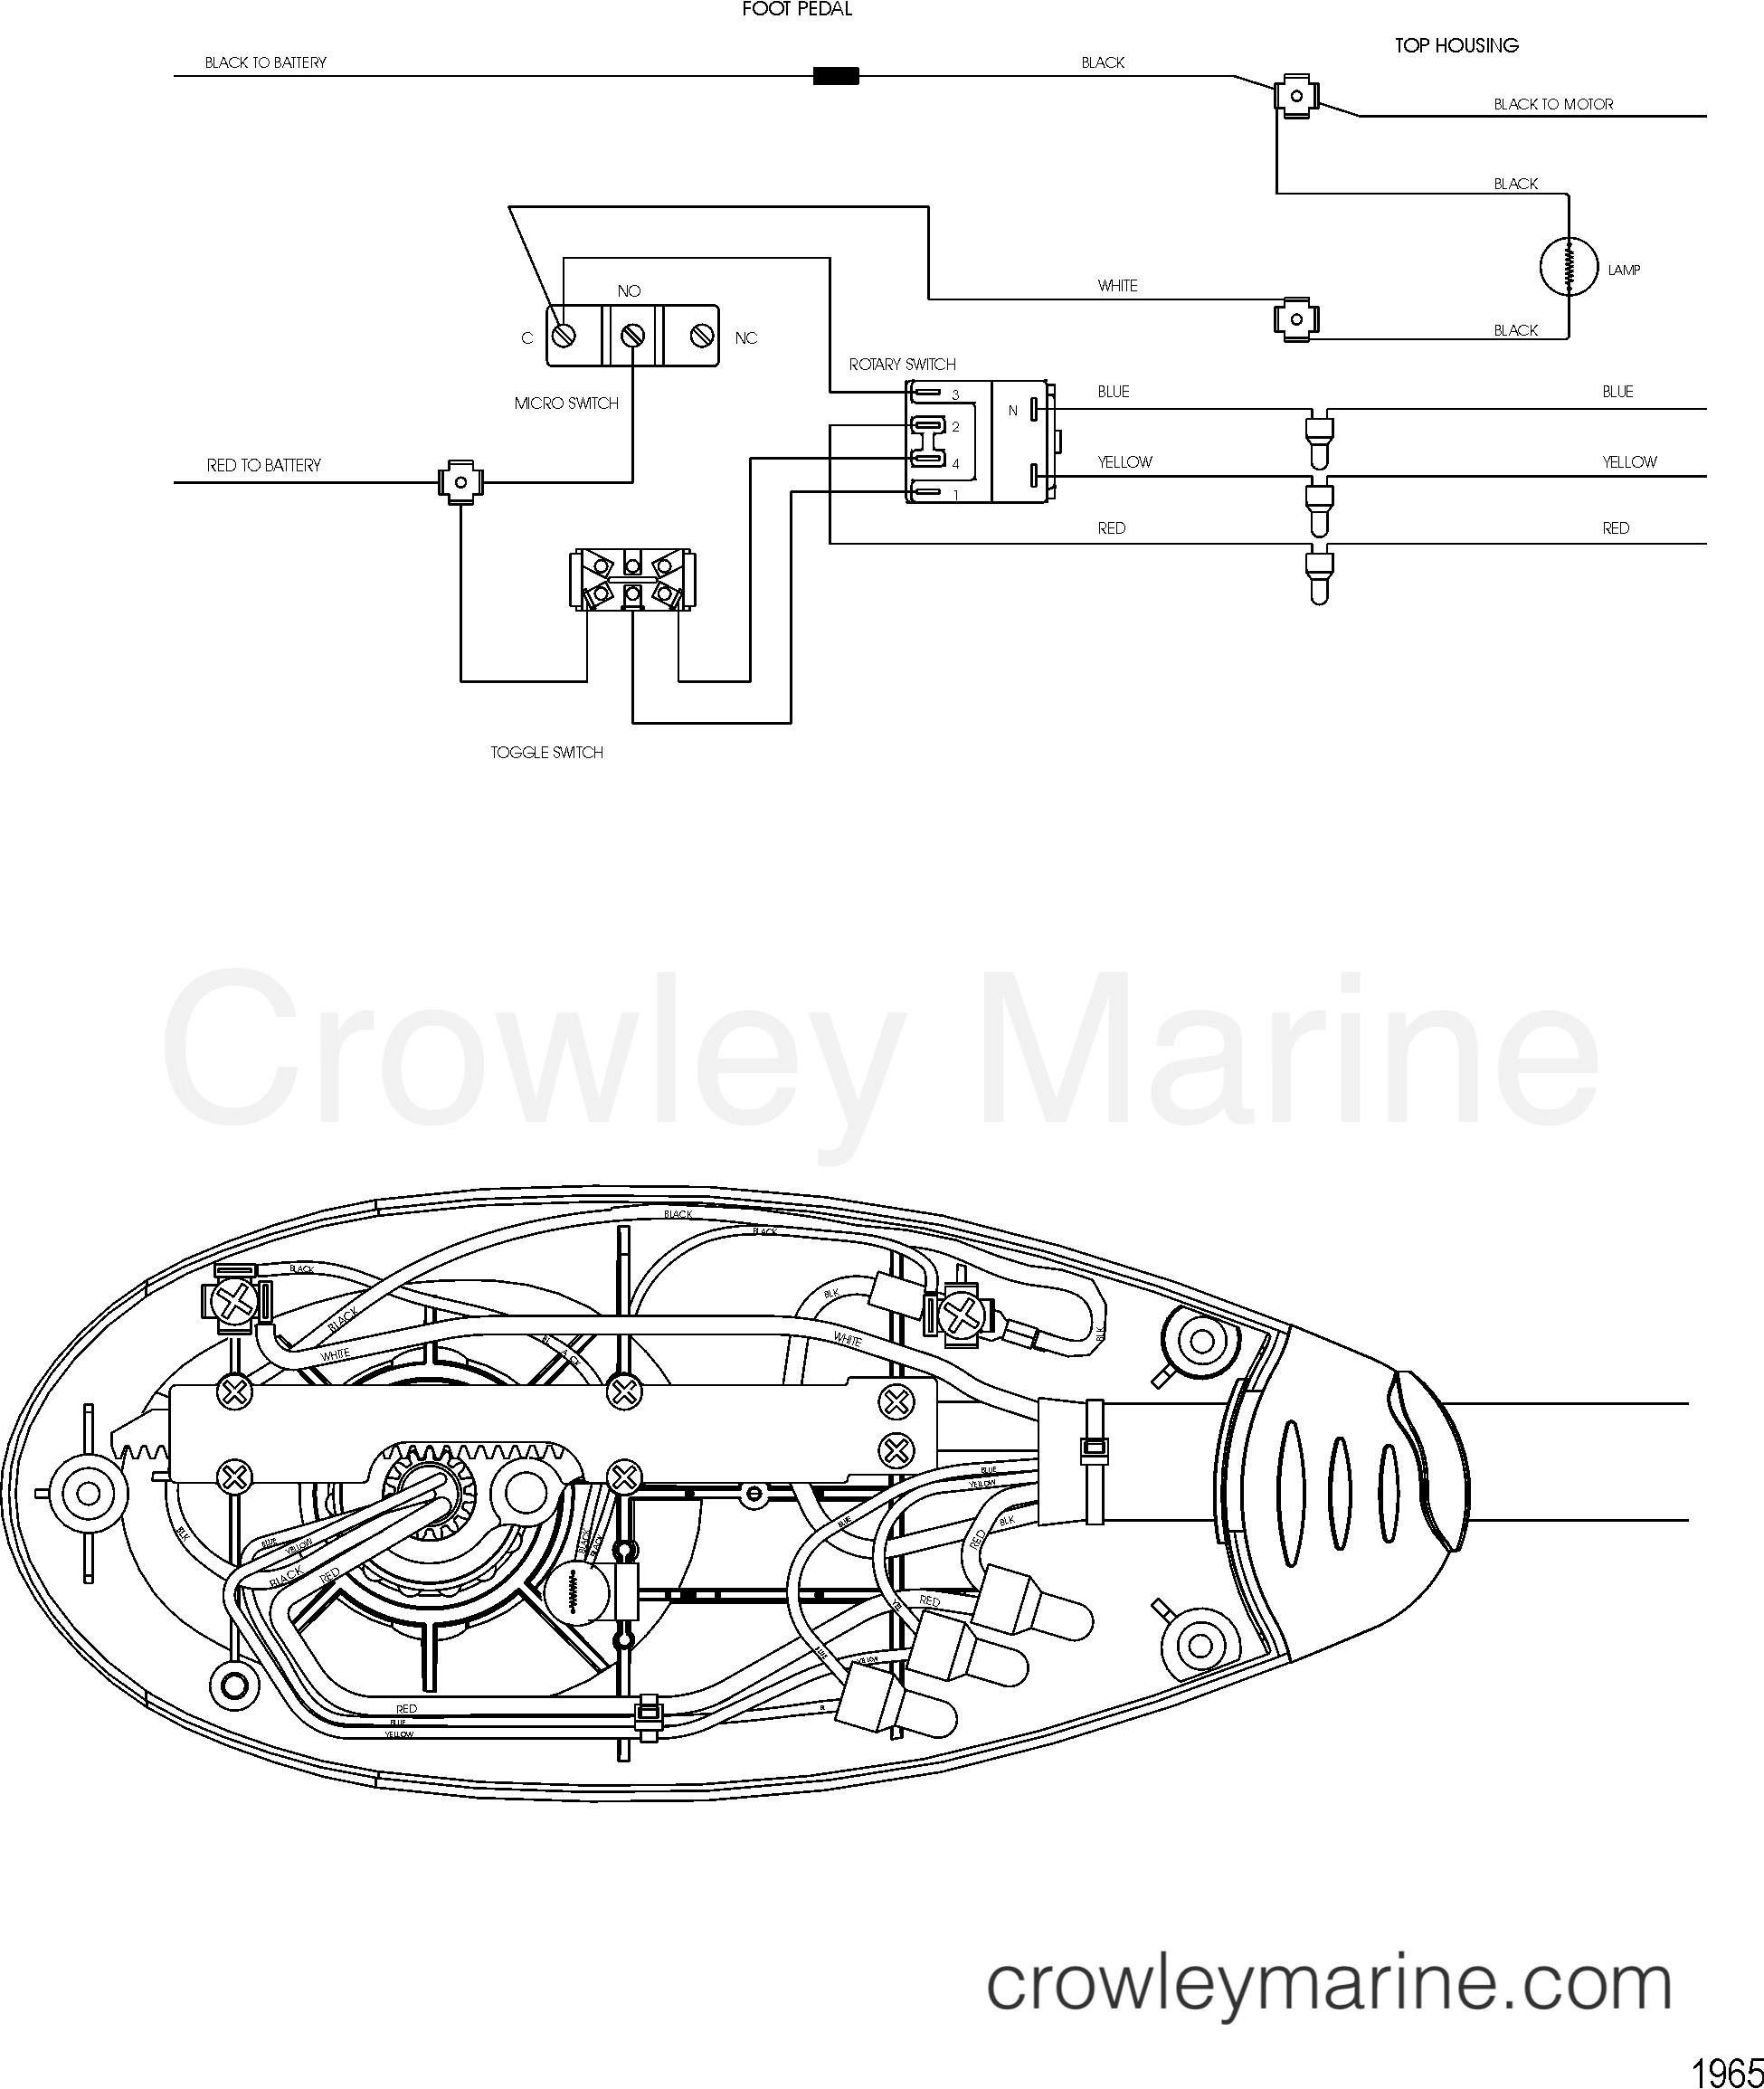 kT9sbW5Z motorguide foot wiring diagram trusted wiring diagram